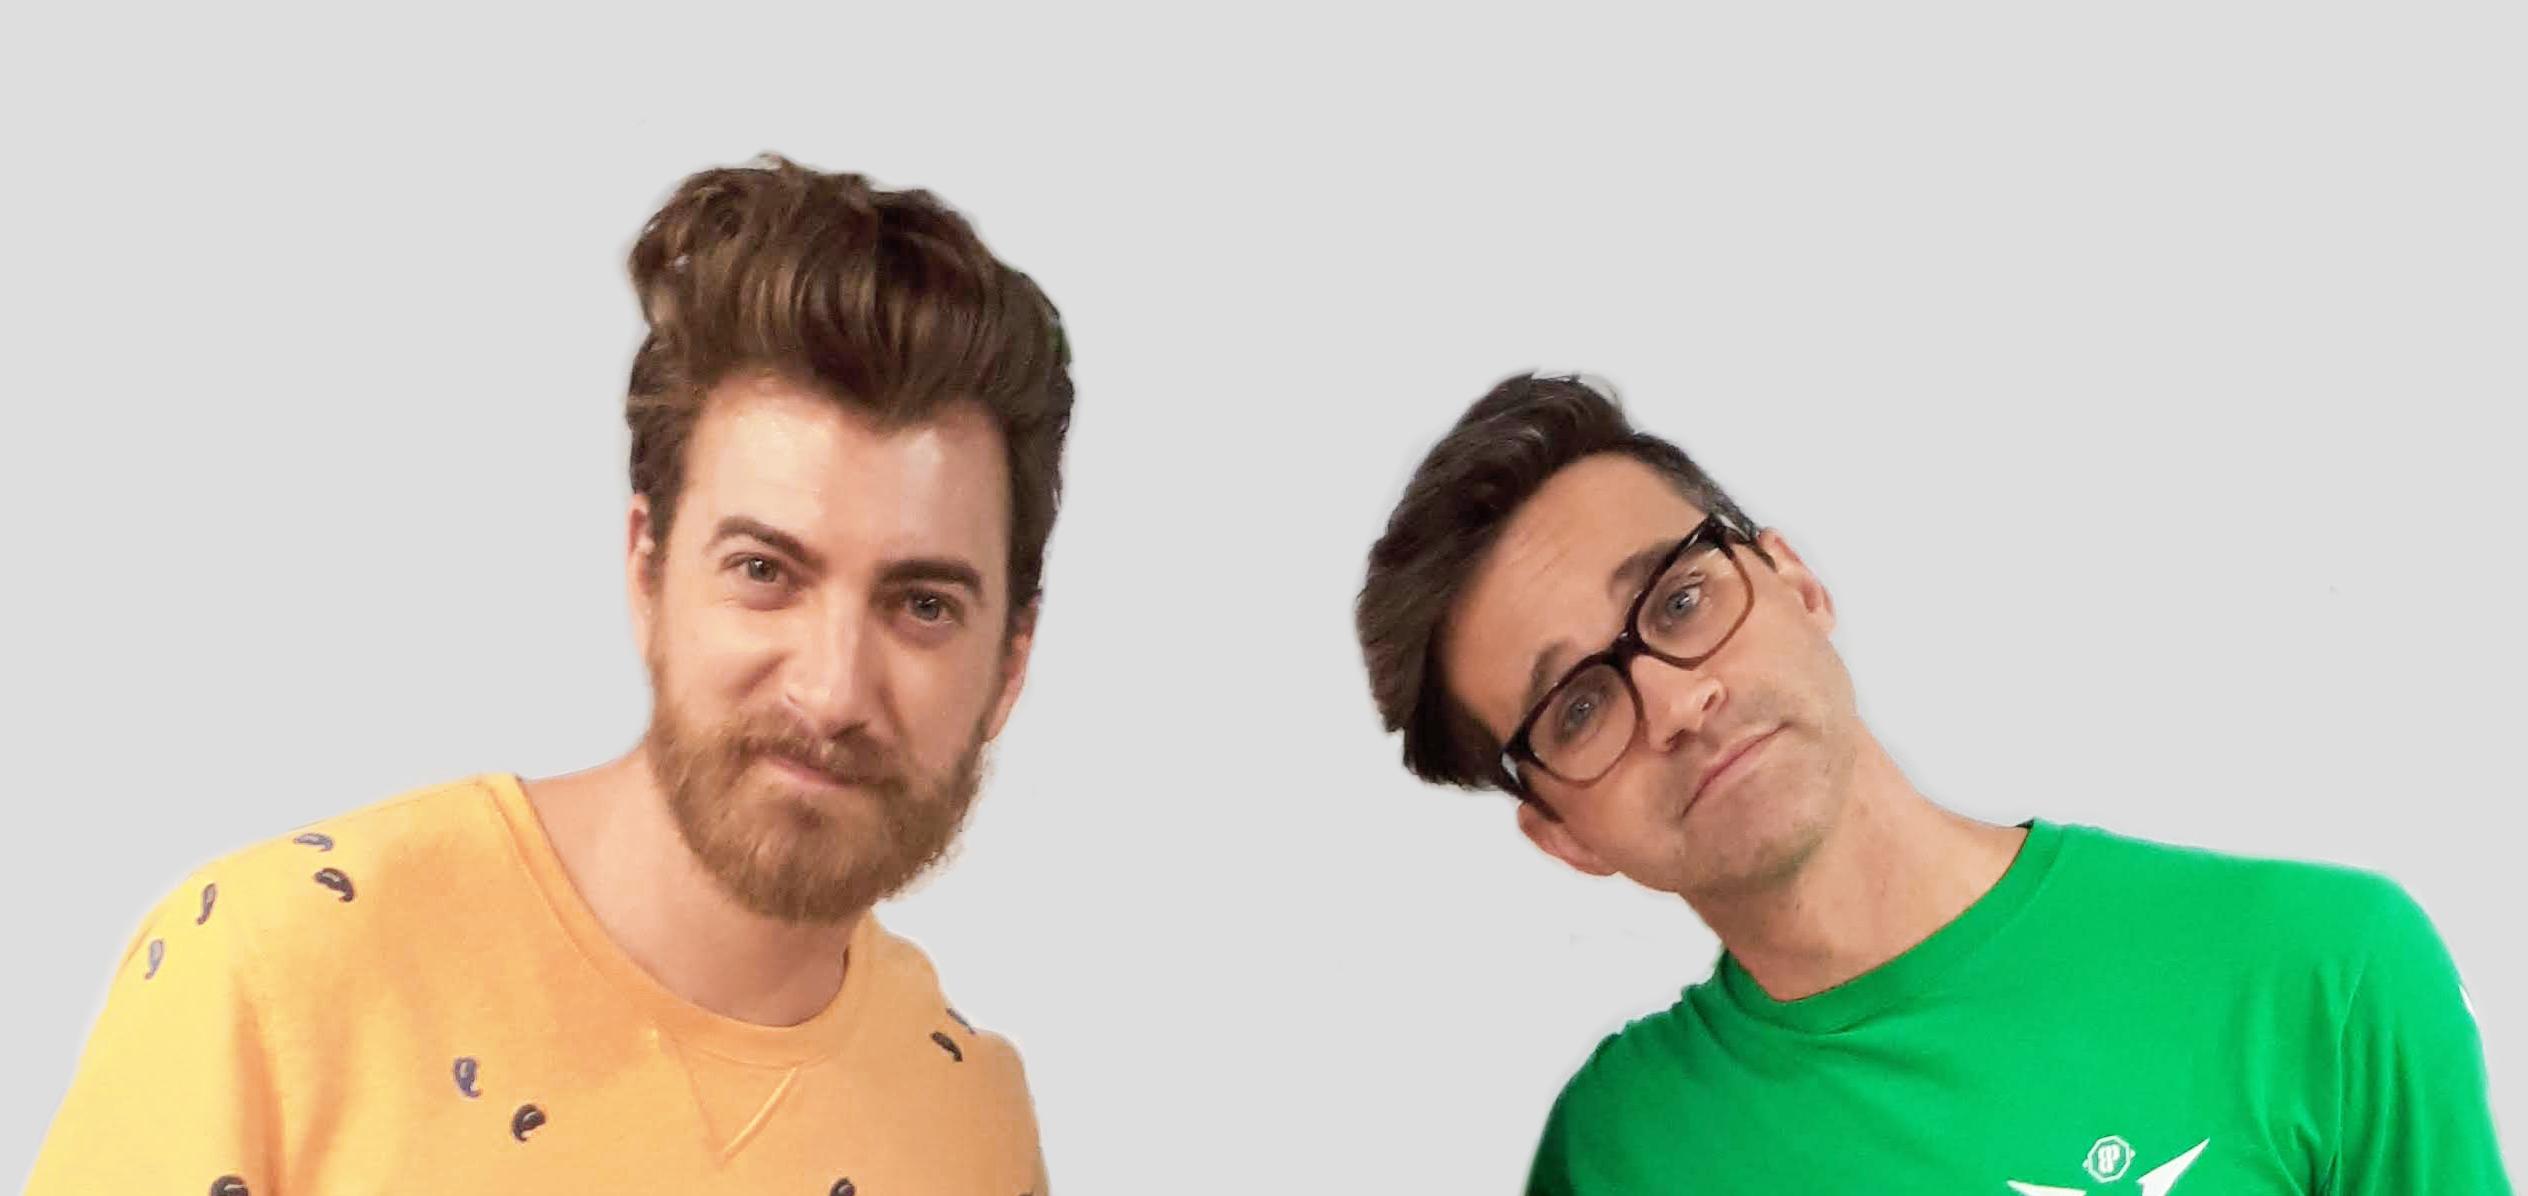 Rhett & Link - Wikipedia